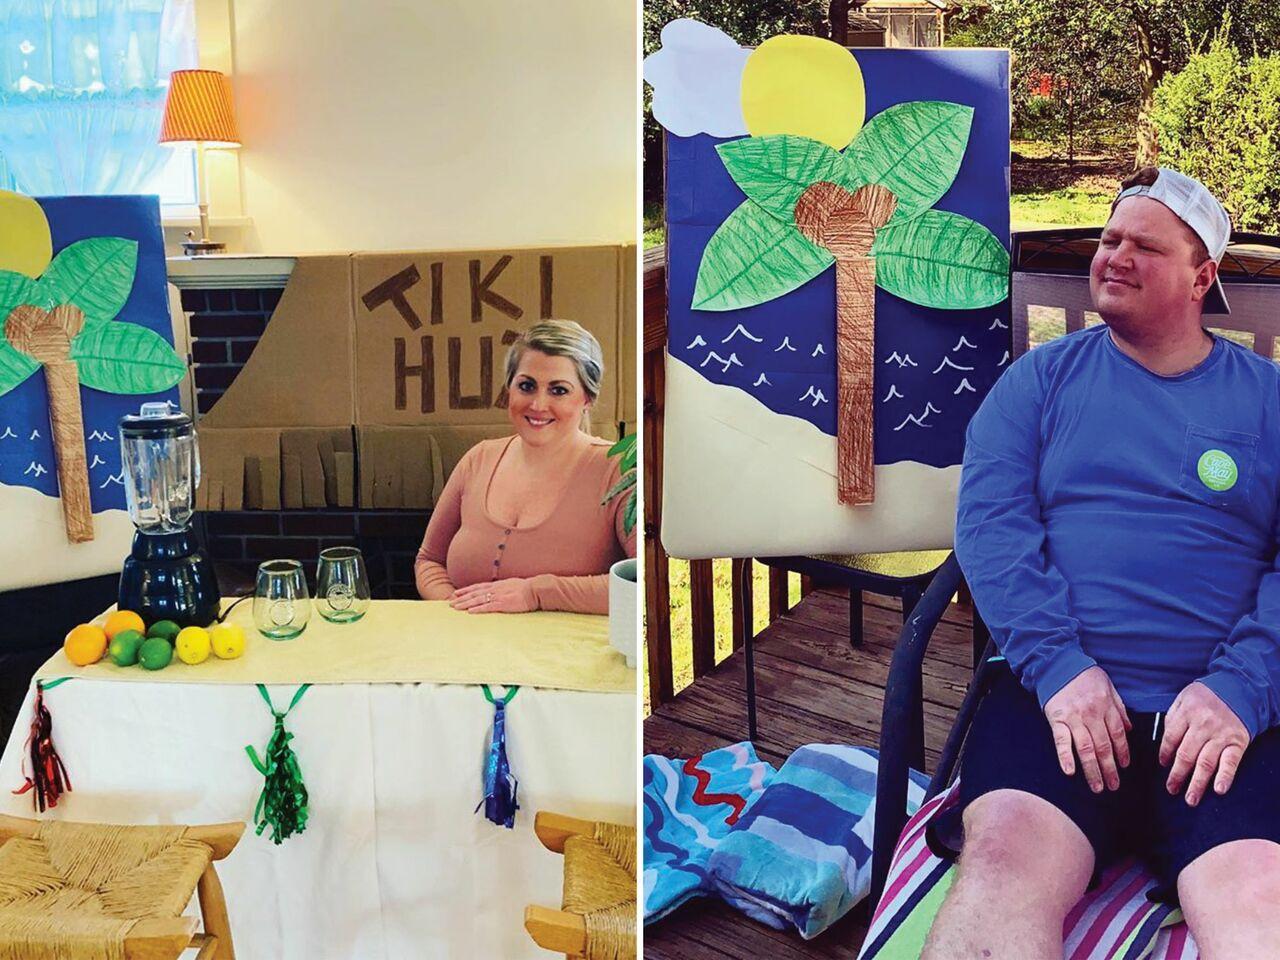 couple homeymoon stay at home honeymoon ideas